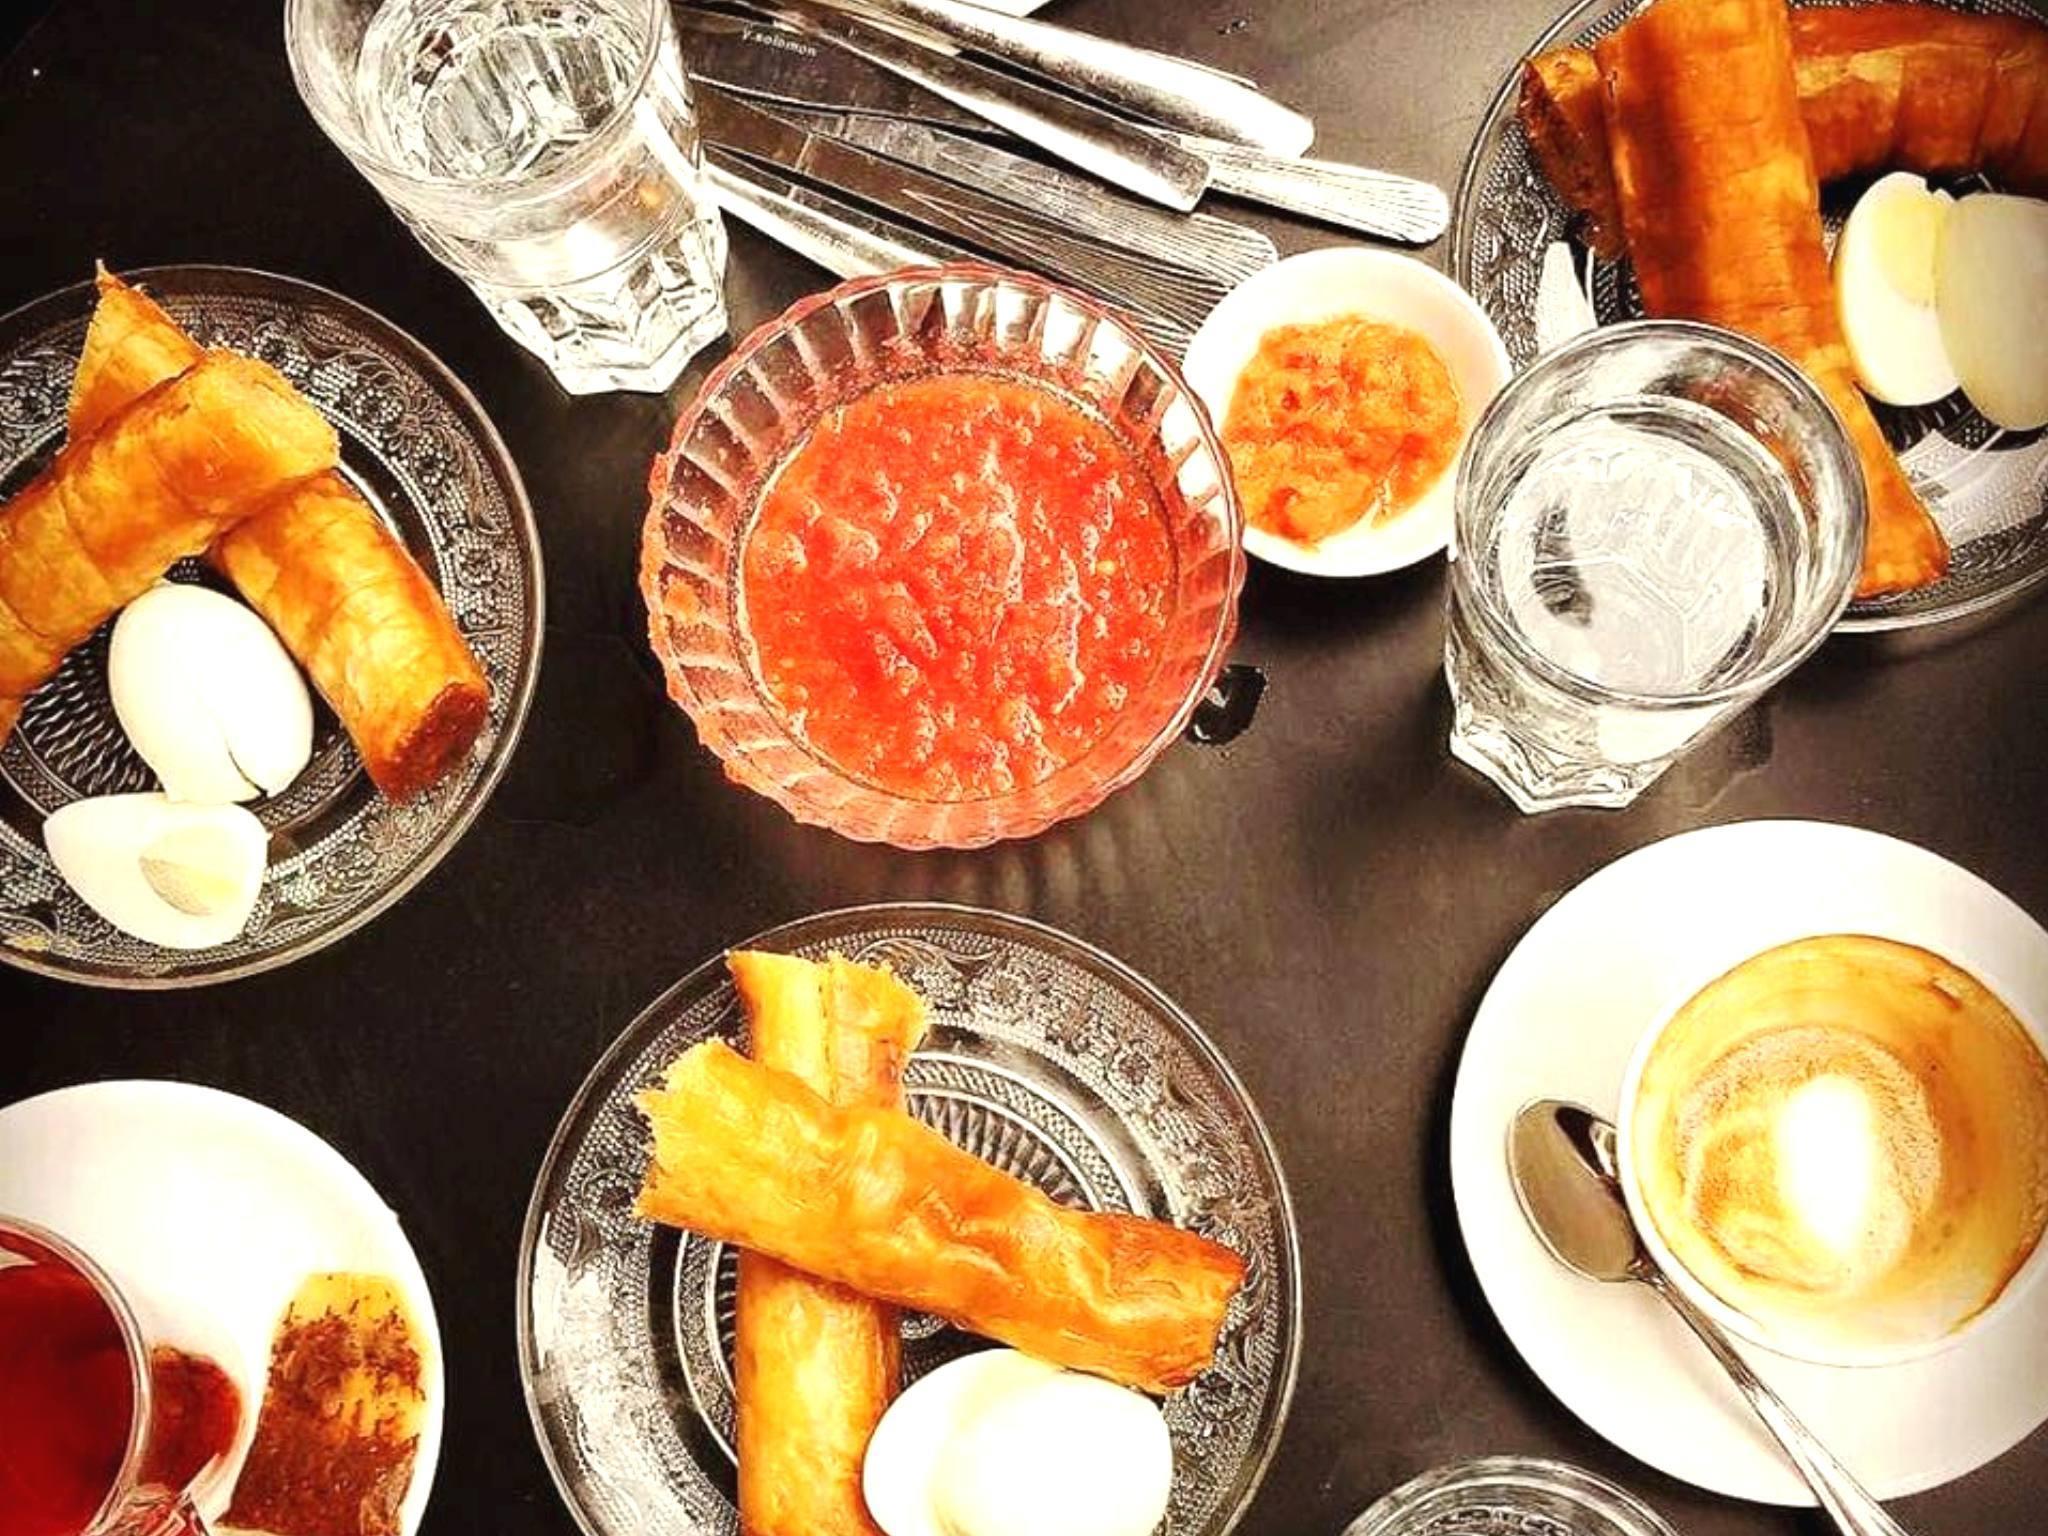 Jachnun at noon: the dos and don'ts of the flaky Shabbat breakfast staple